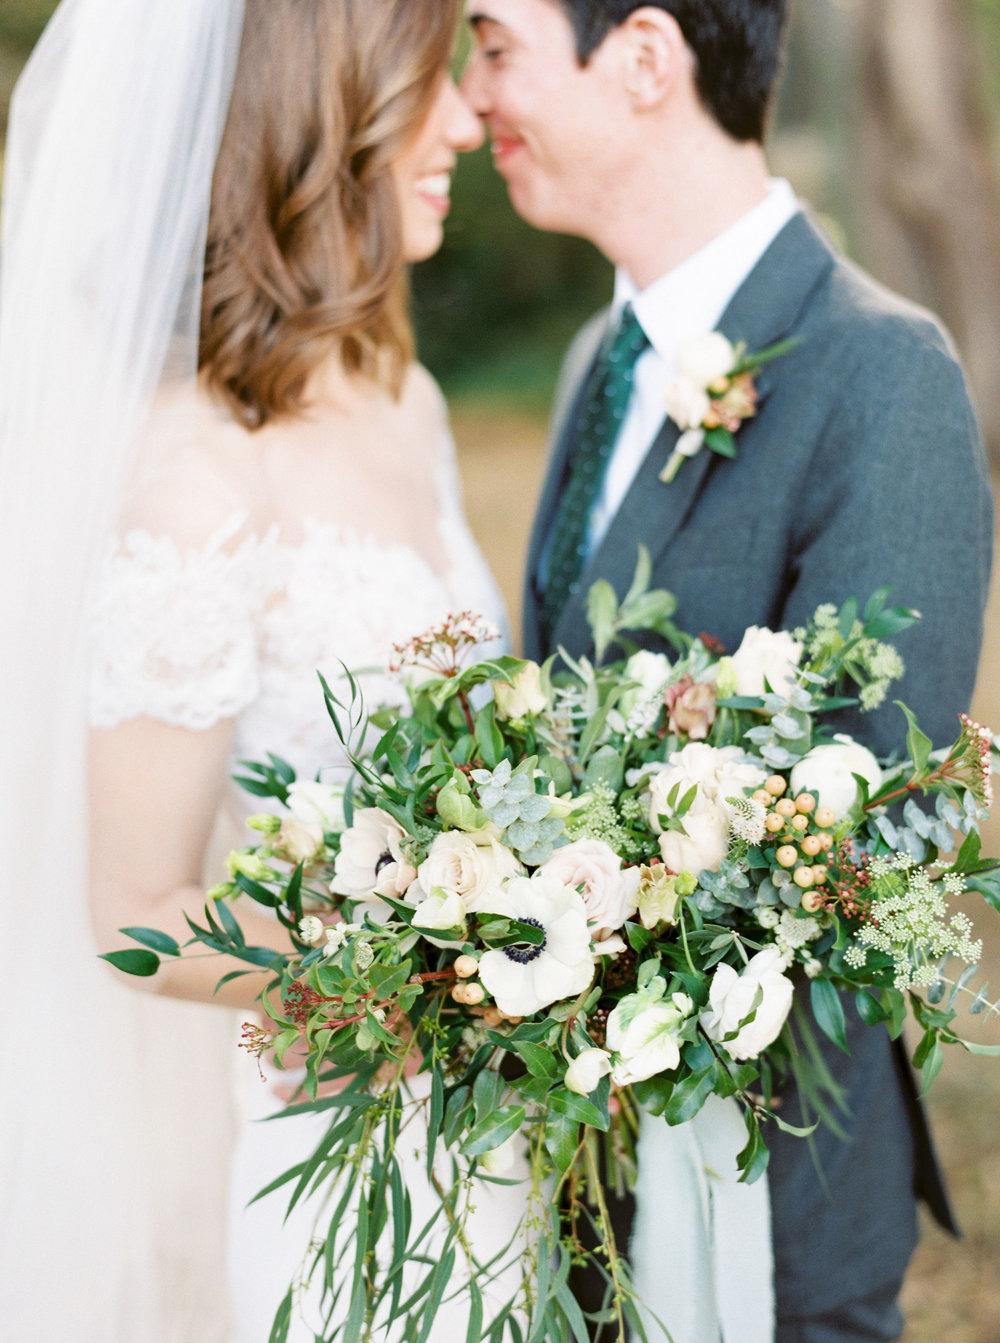 Log-cabin-wedding-in-presidio-san-francisco-california-desintation-wedding-photography-54.jpg